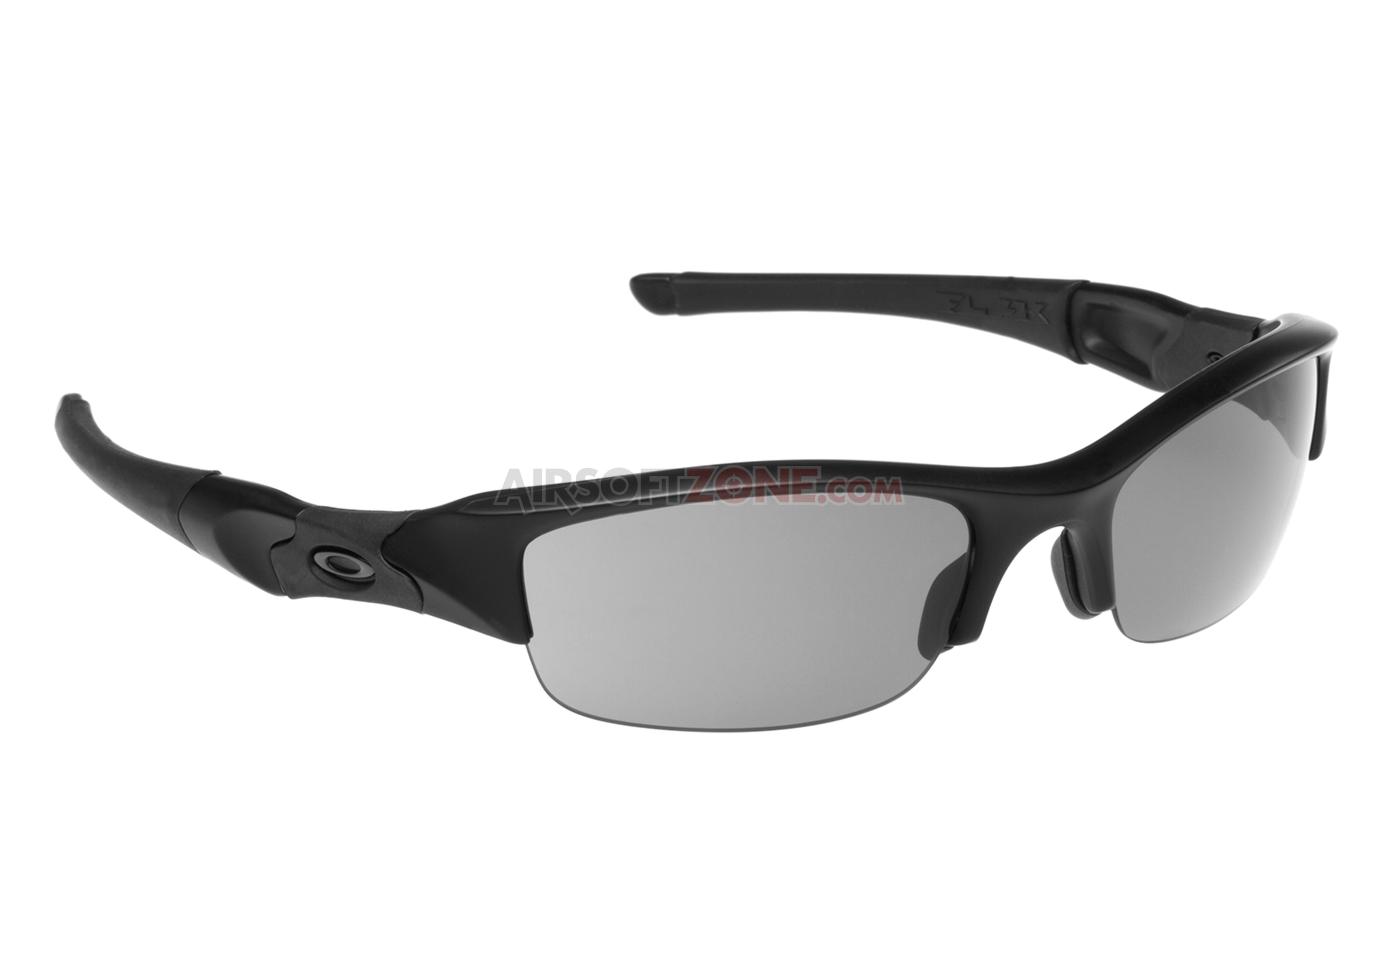 c32efeac10c31 SI Flak Jacket Black (Oakley) - Eyewear - Protective Equipment ...